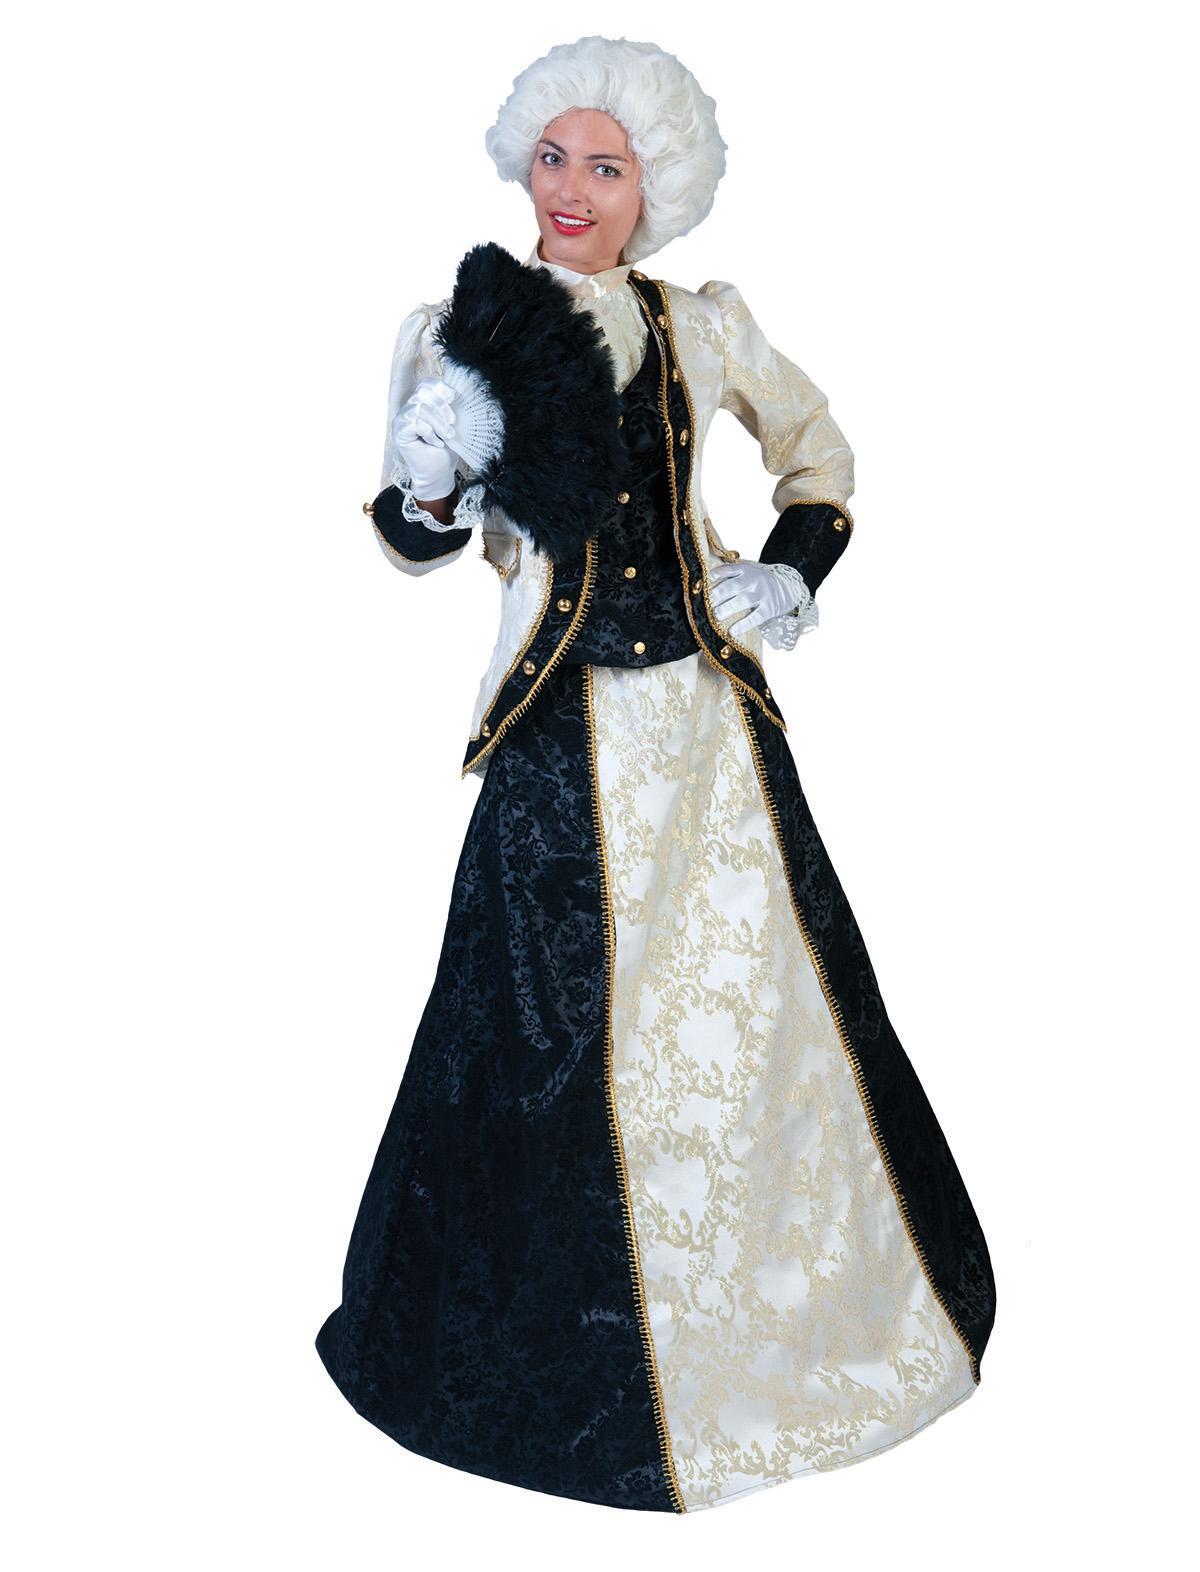 Madame Jaqueline